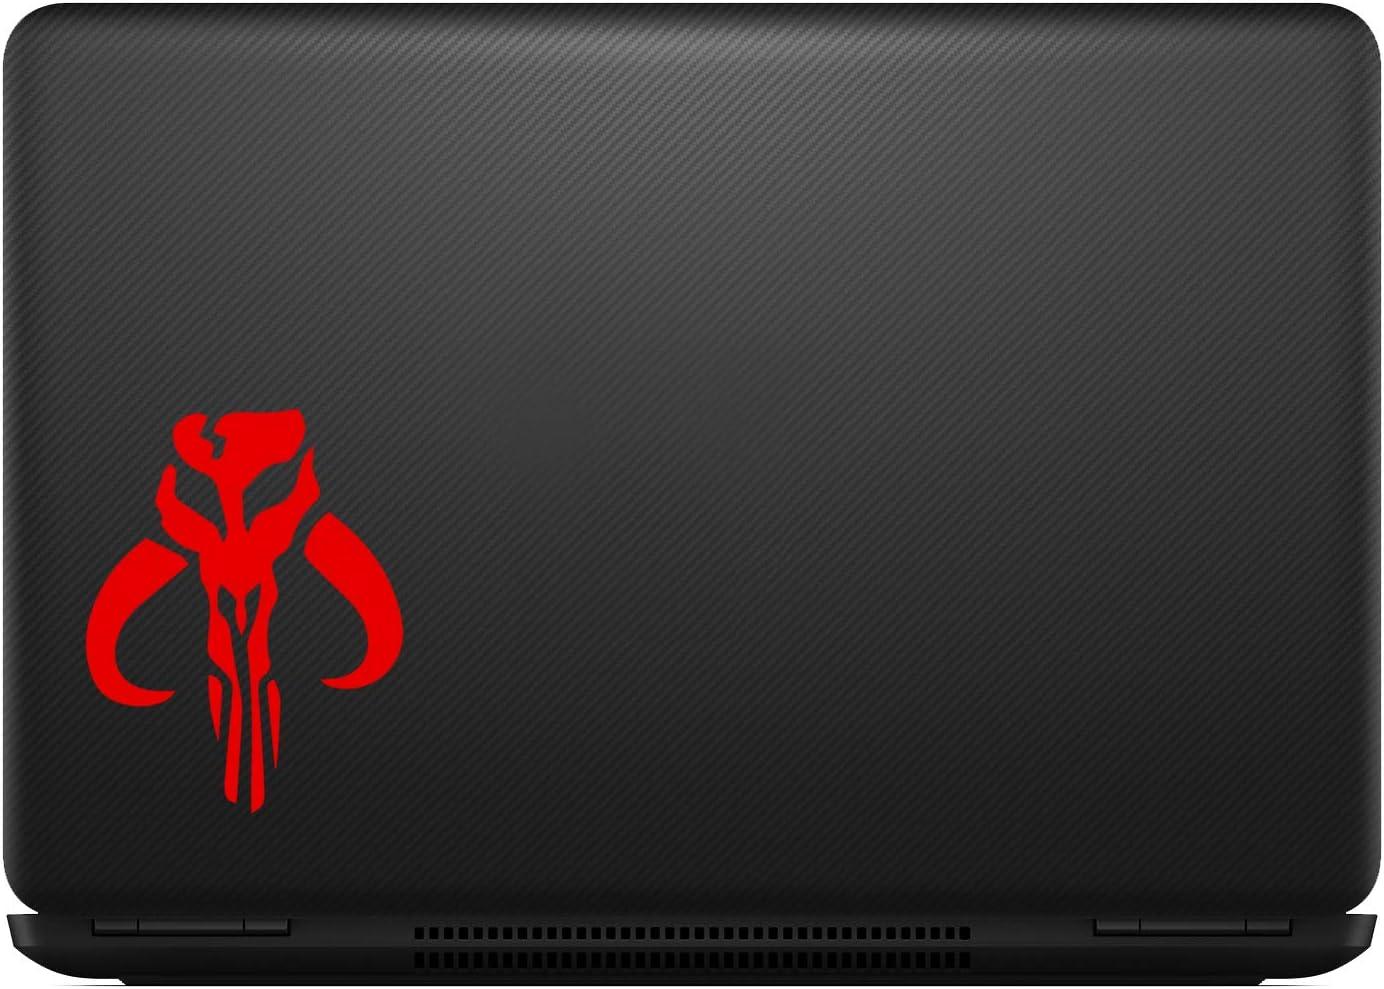 Red Bargain Max Decals Mandalorian Boba Fett Sticker Decal Notebook Car Laptop 5